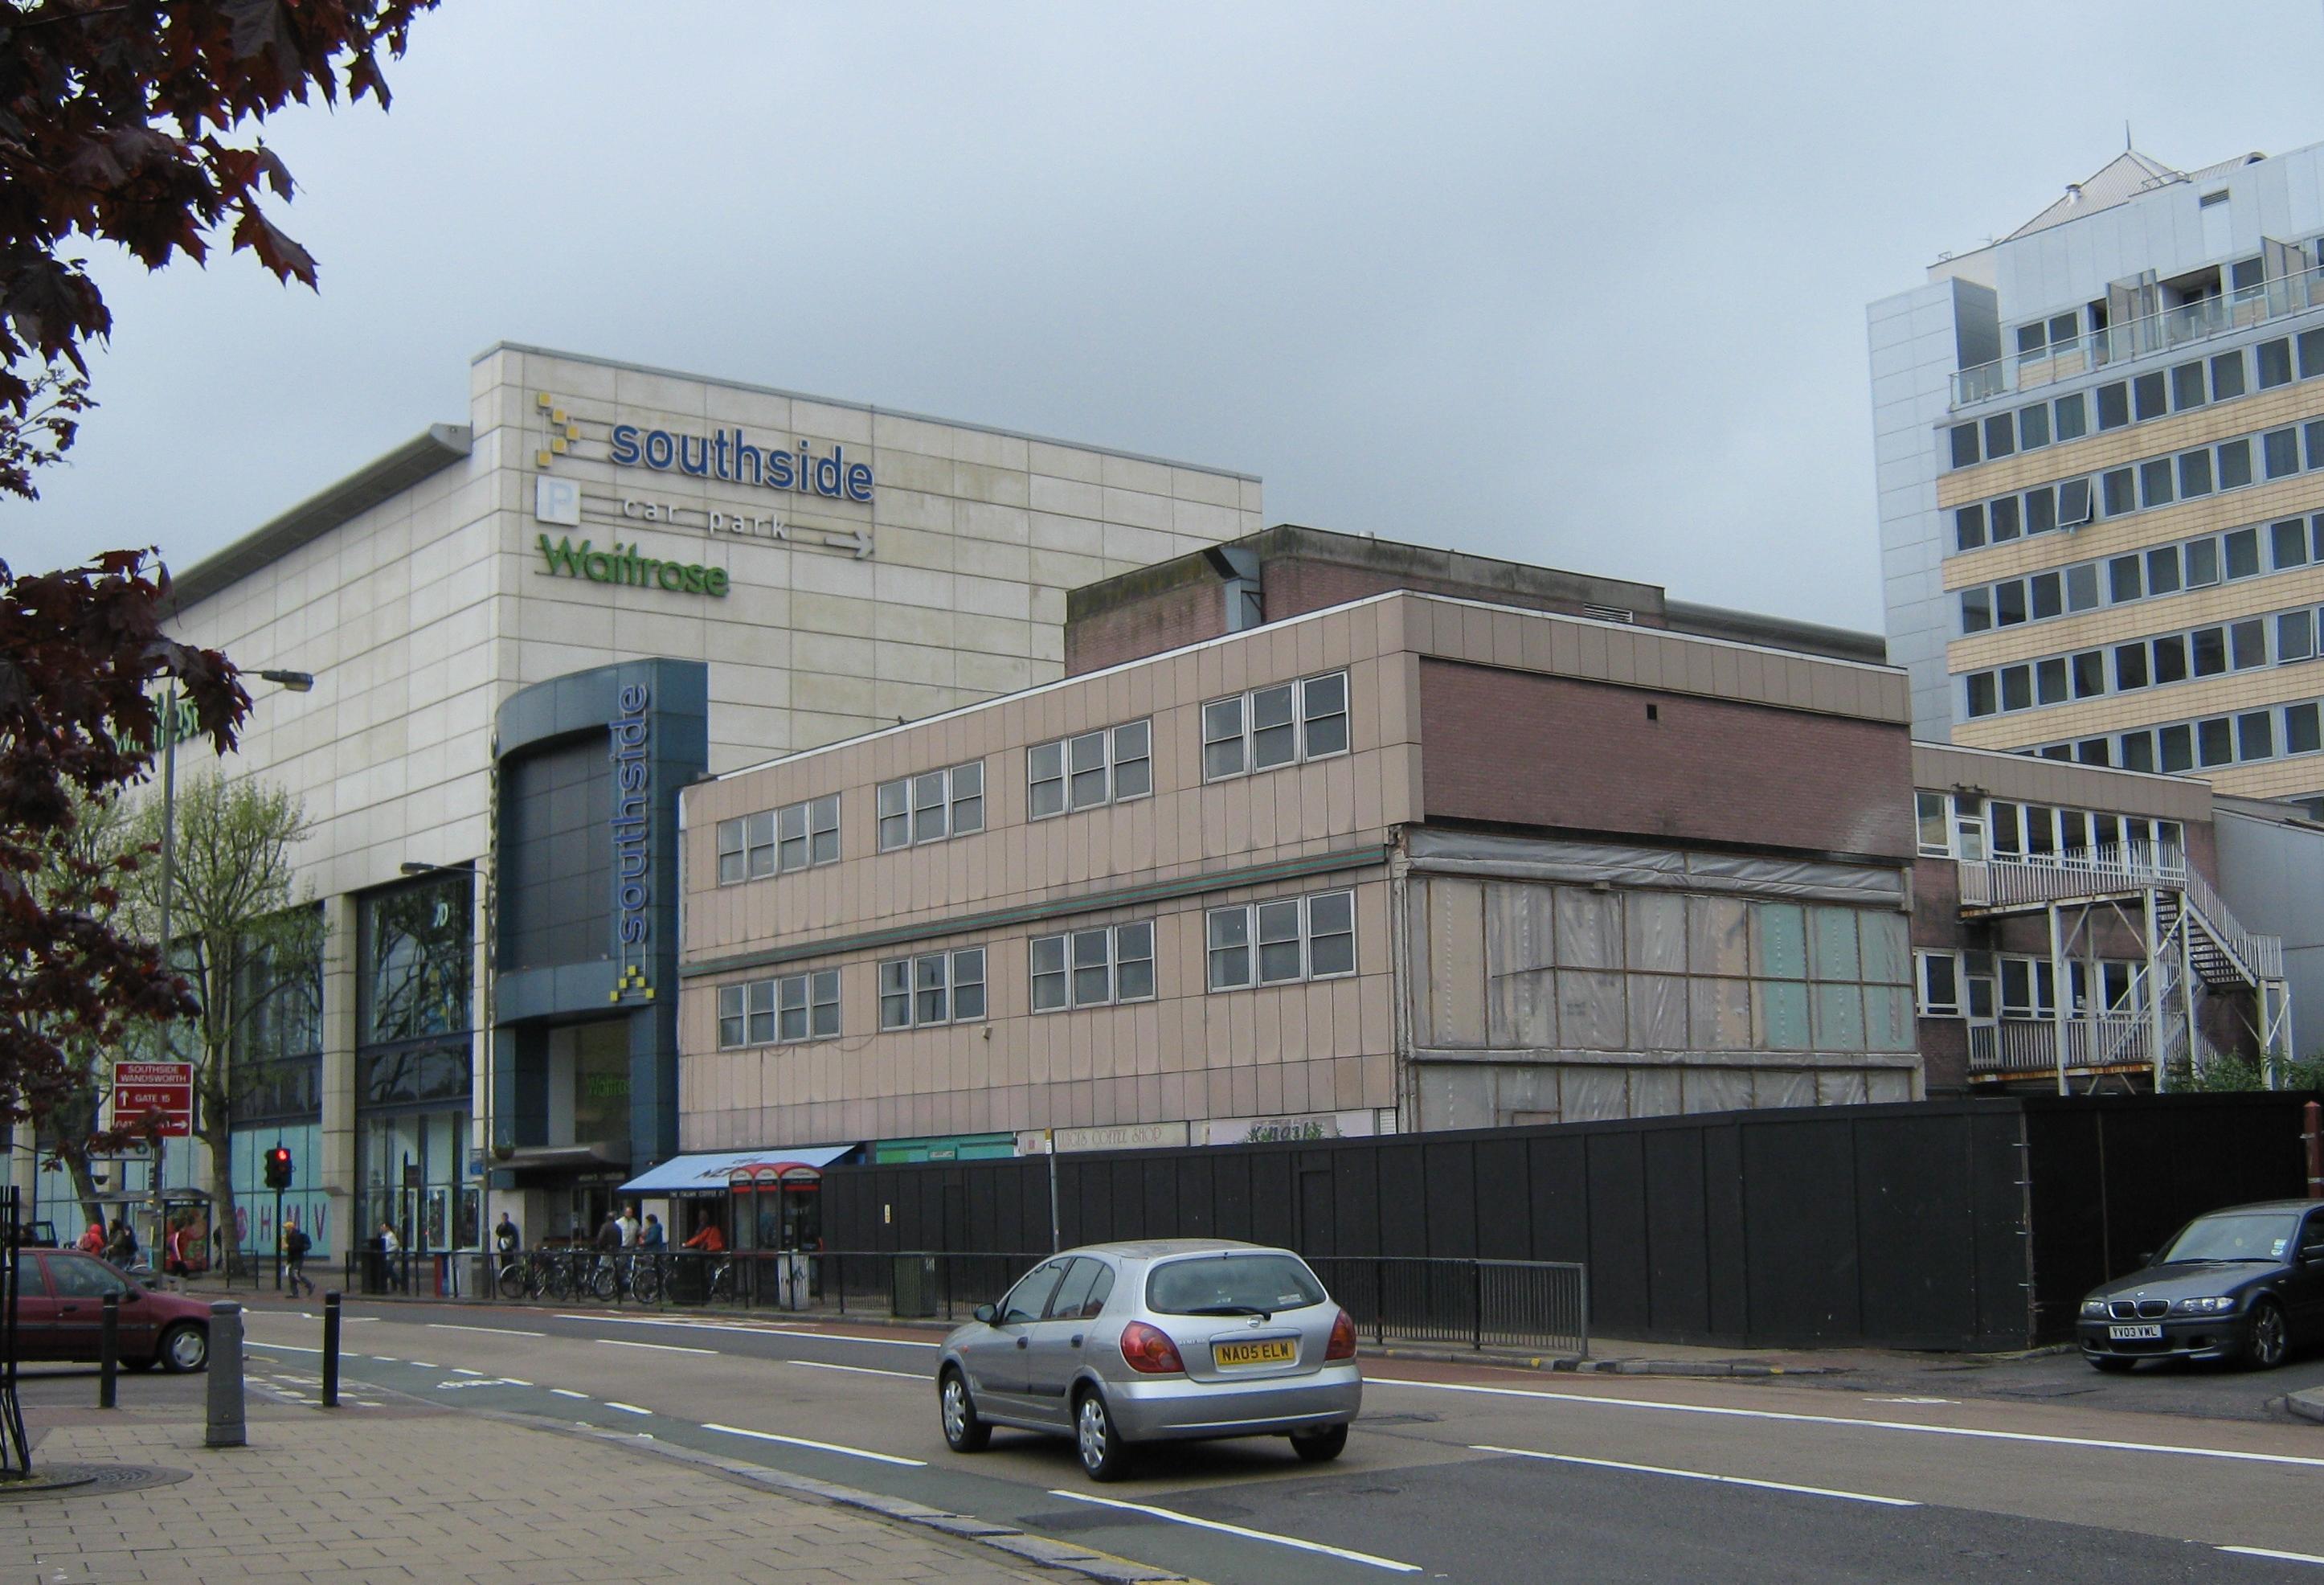 Southside Shopping Centre Halal Restaurant